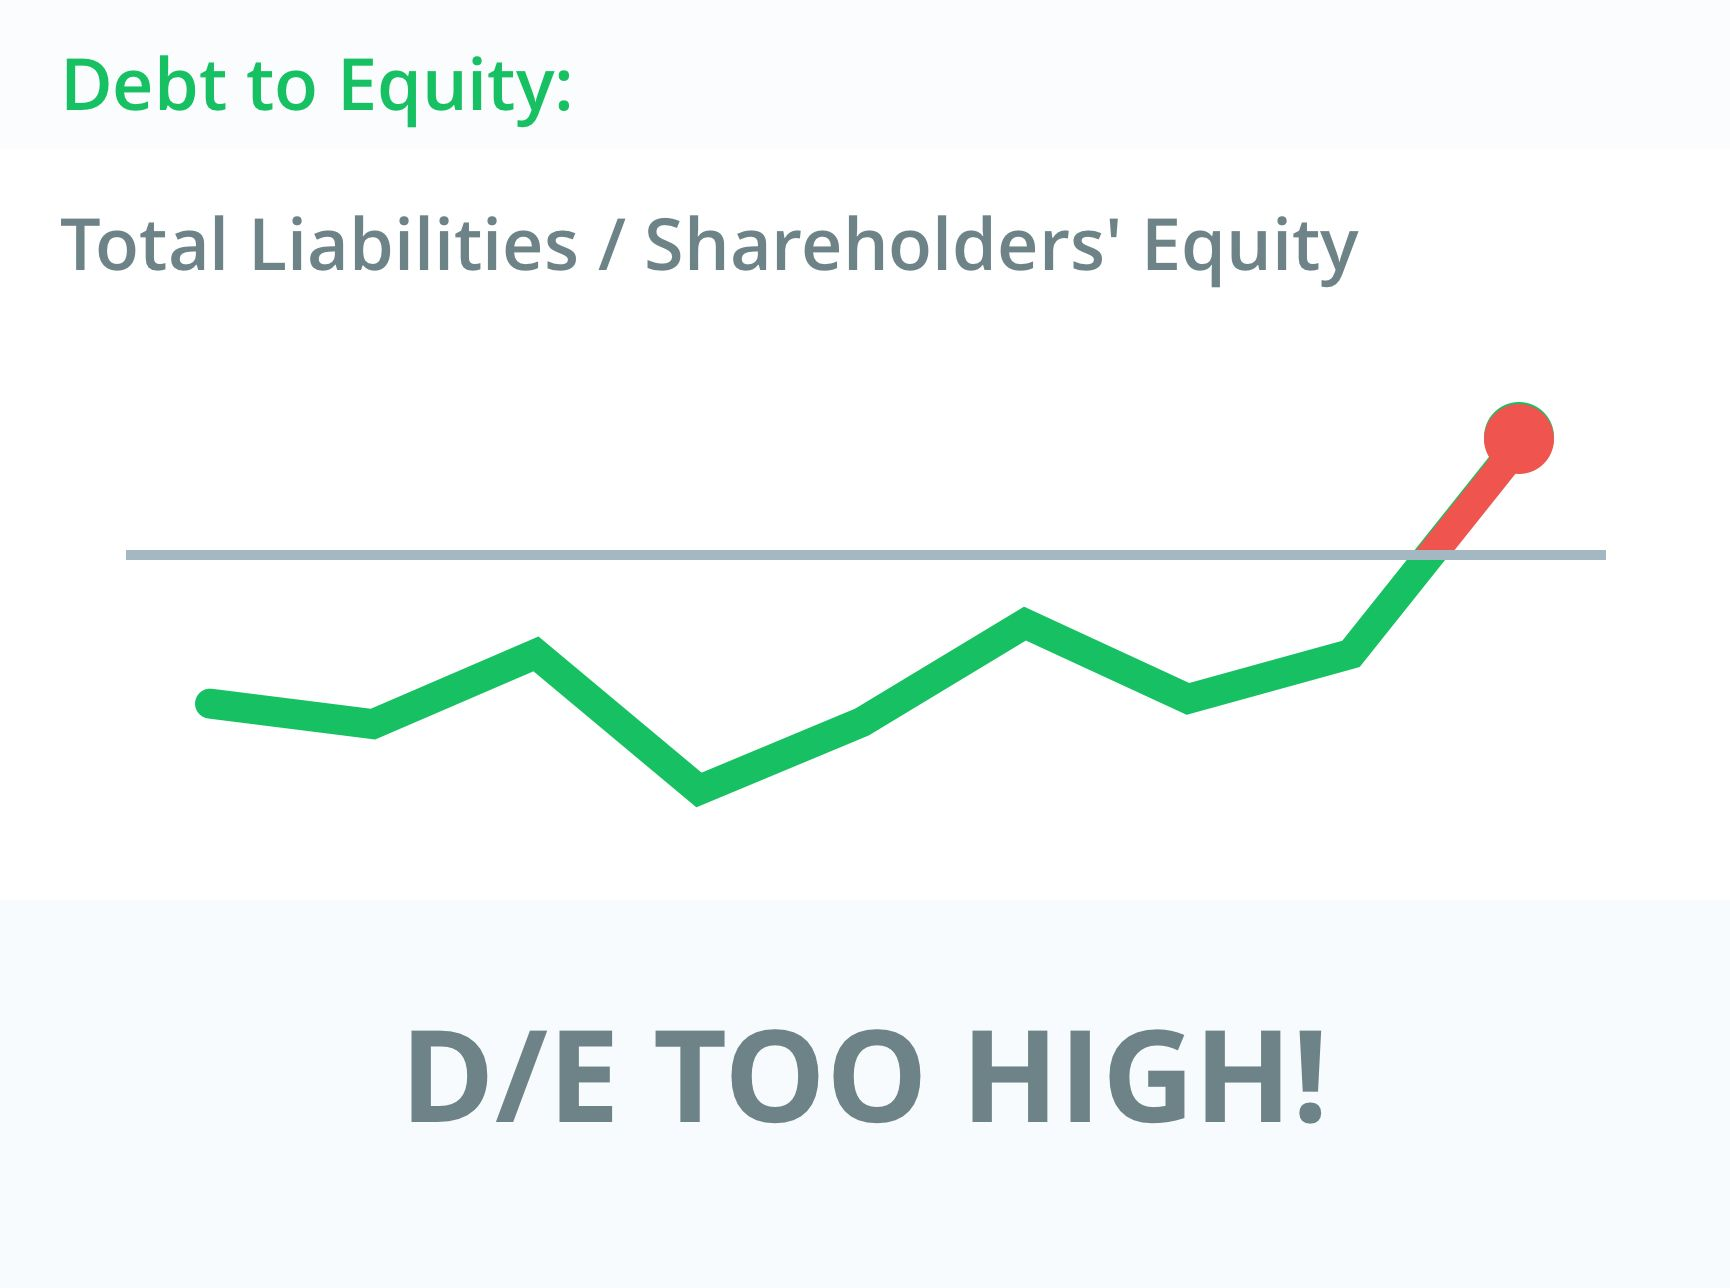 Debt to Equity Ratio - Balance Sheet Metrics